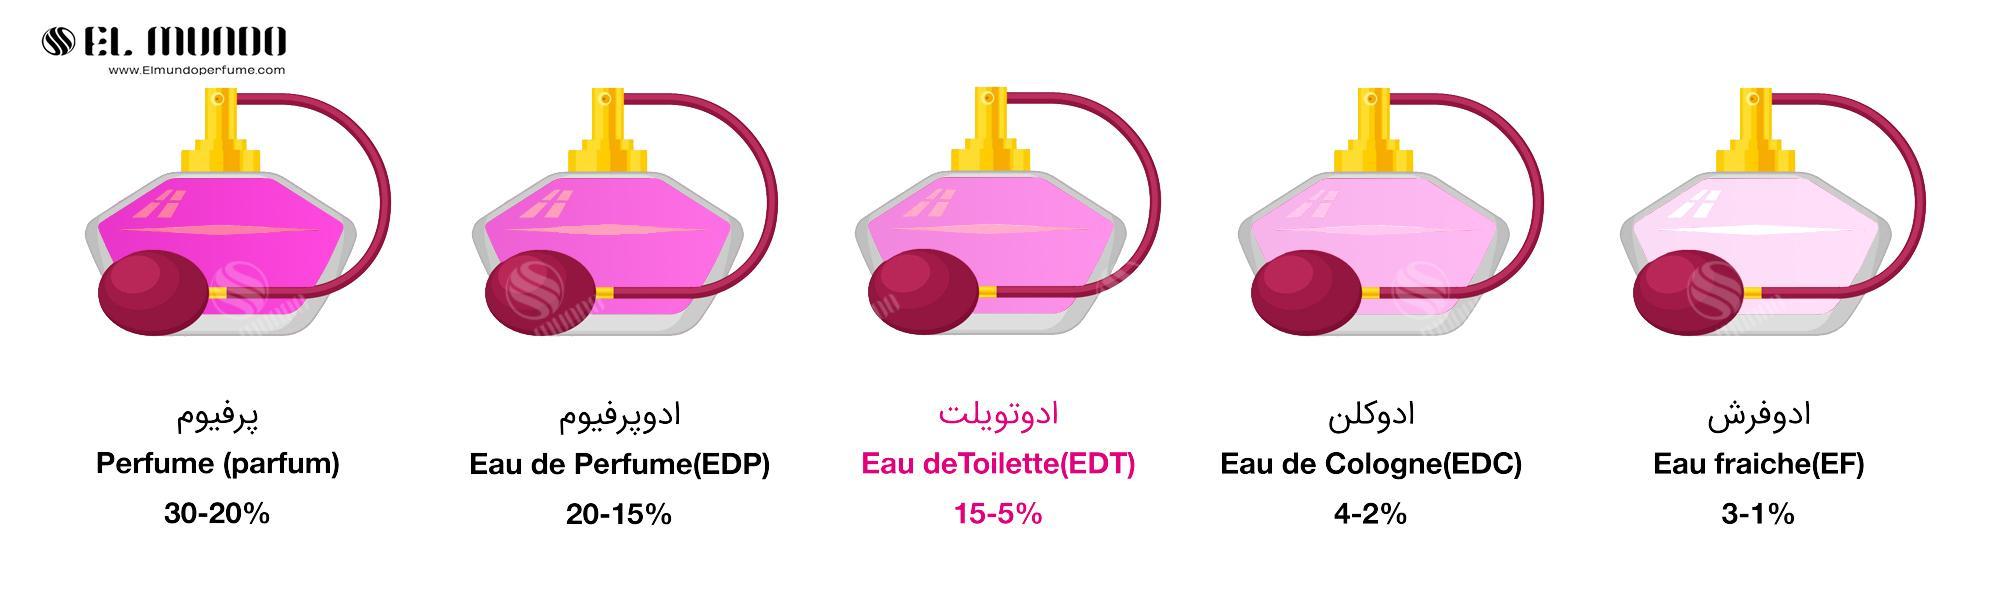 3 eau de toilette2 - عطر ادکلن ردانه دانهیل ابی دیزایر بلو ادو تویلت ۱۰۰ میل Desire Blue